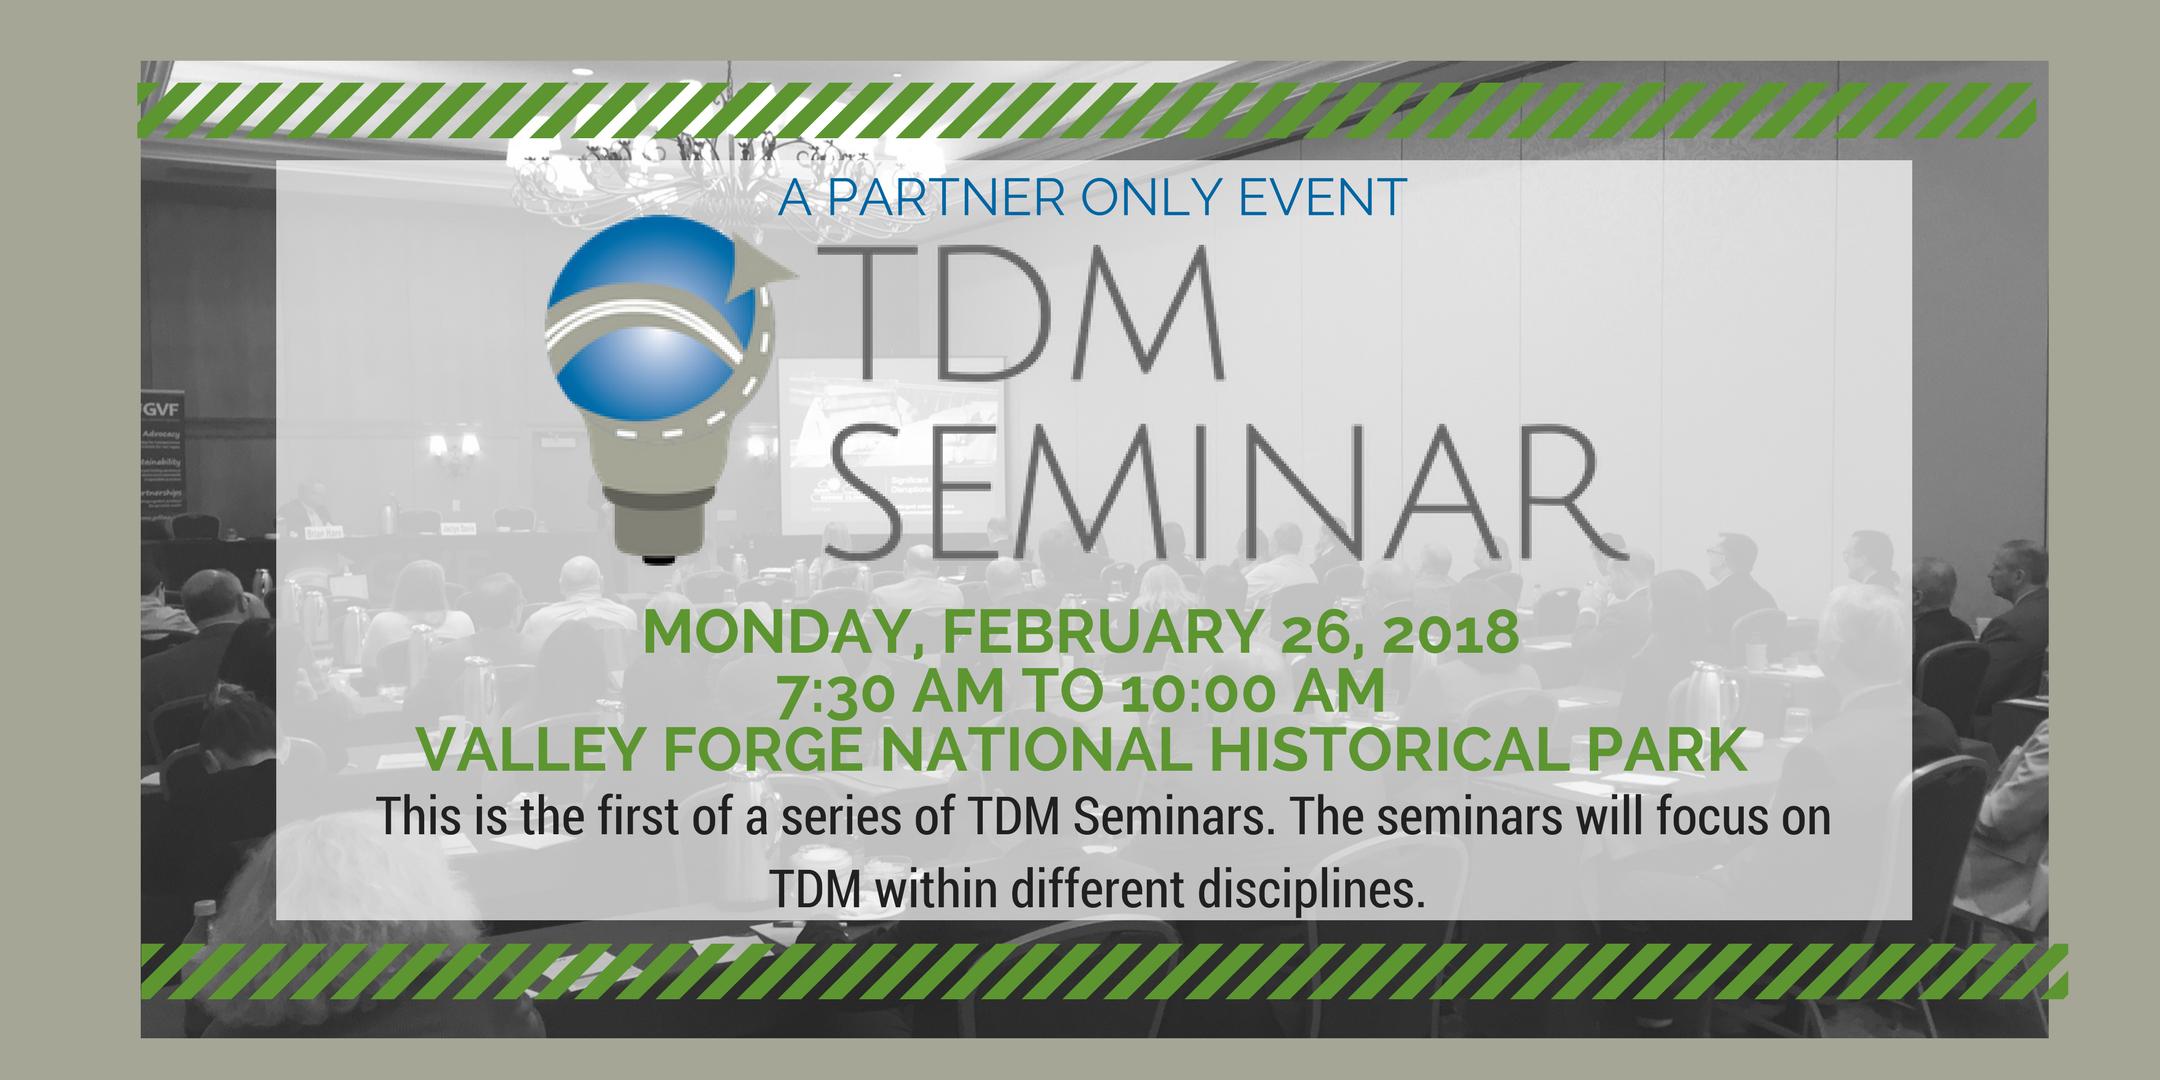 TDM Seminar - A Partner Event